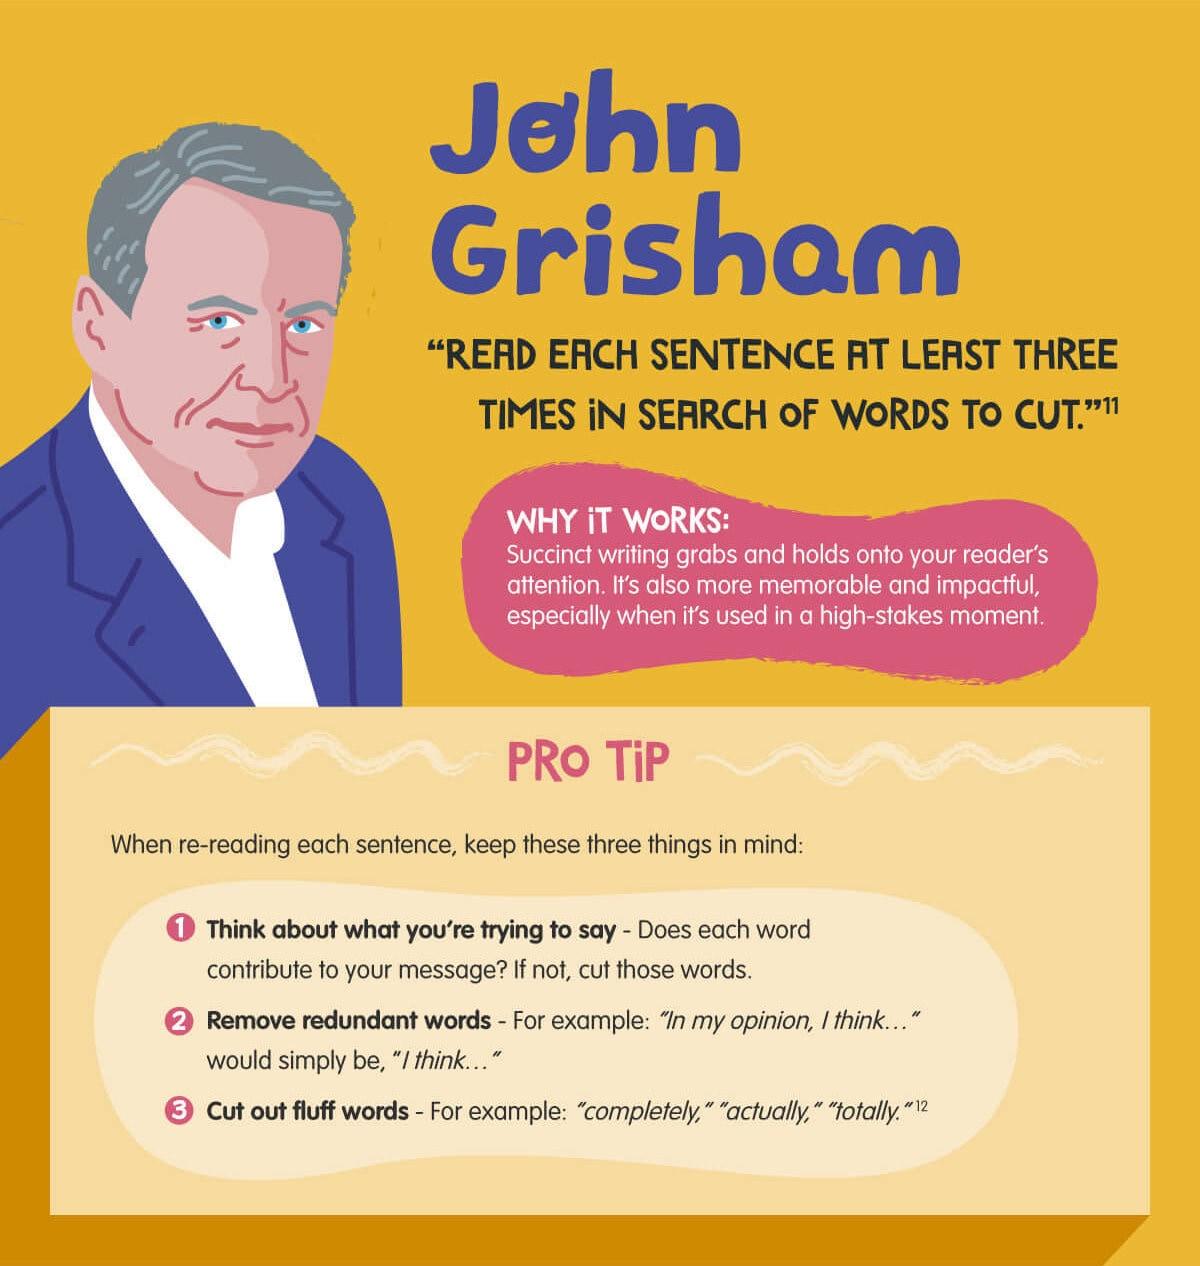 Best writing tip from John Grisham